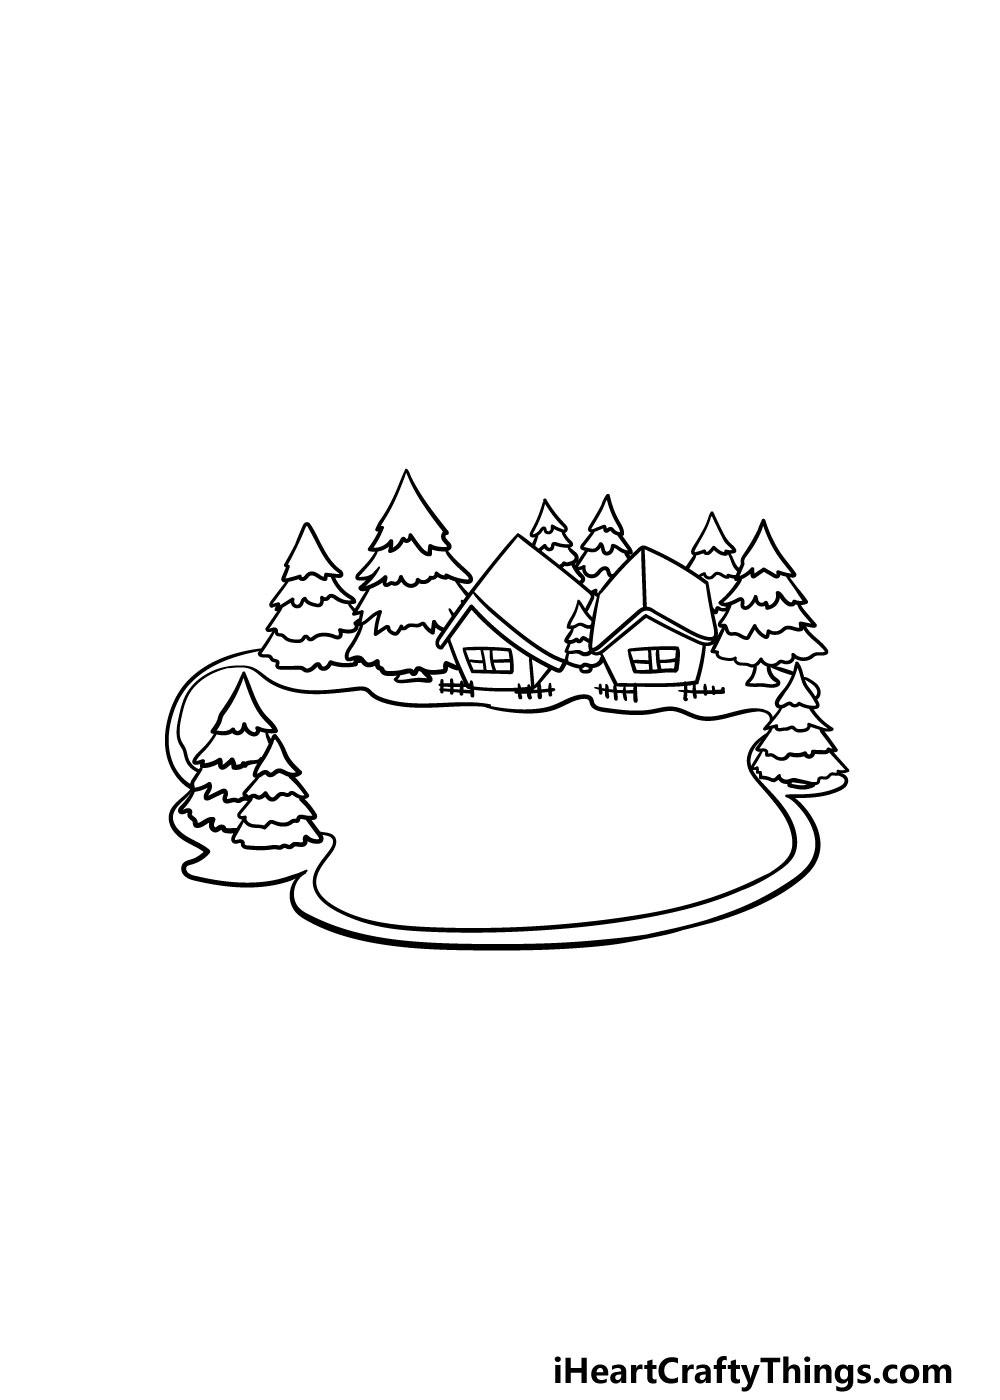 drawing a lake step 6